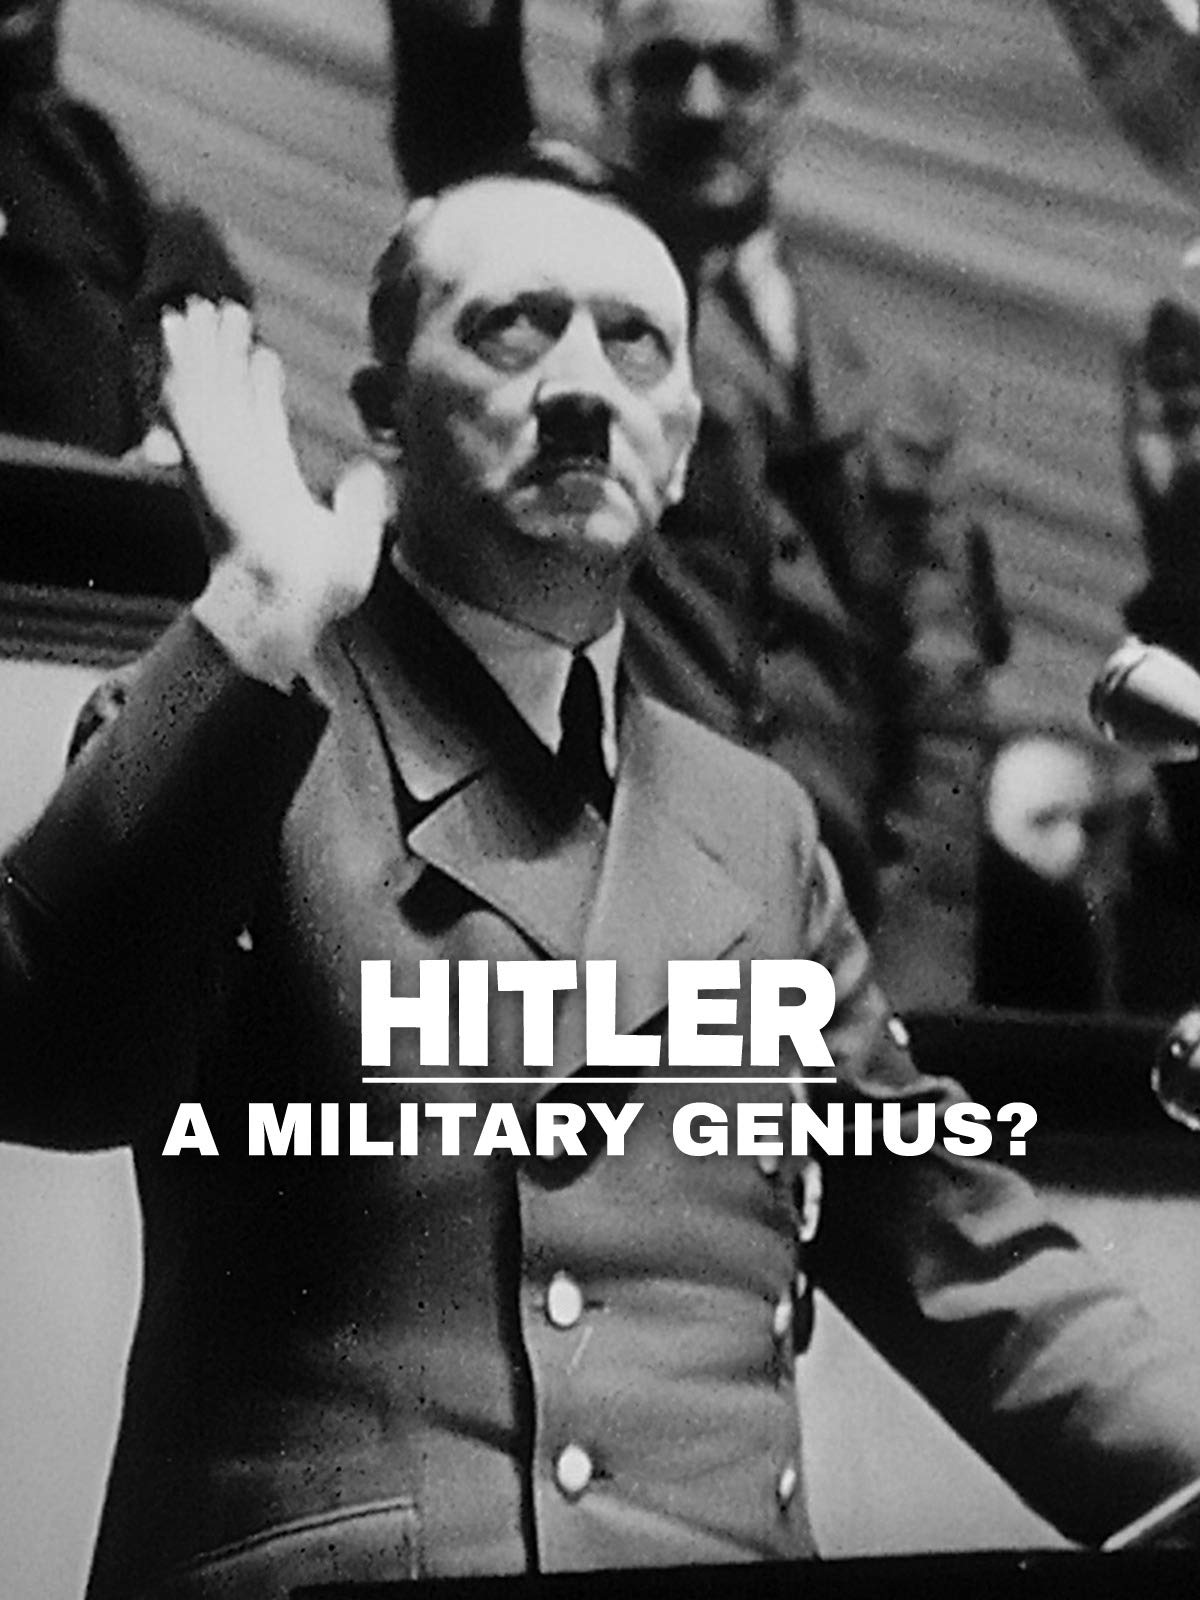 Hitler, a military genius?